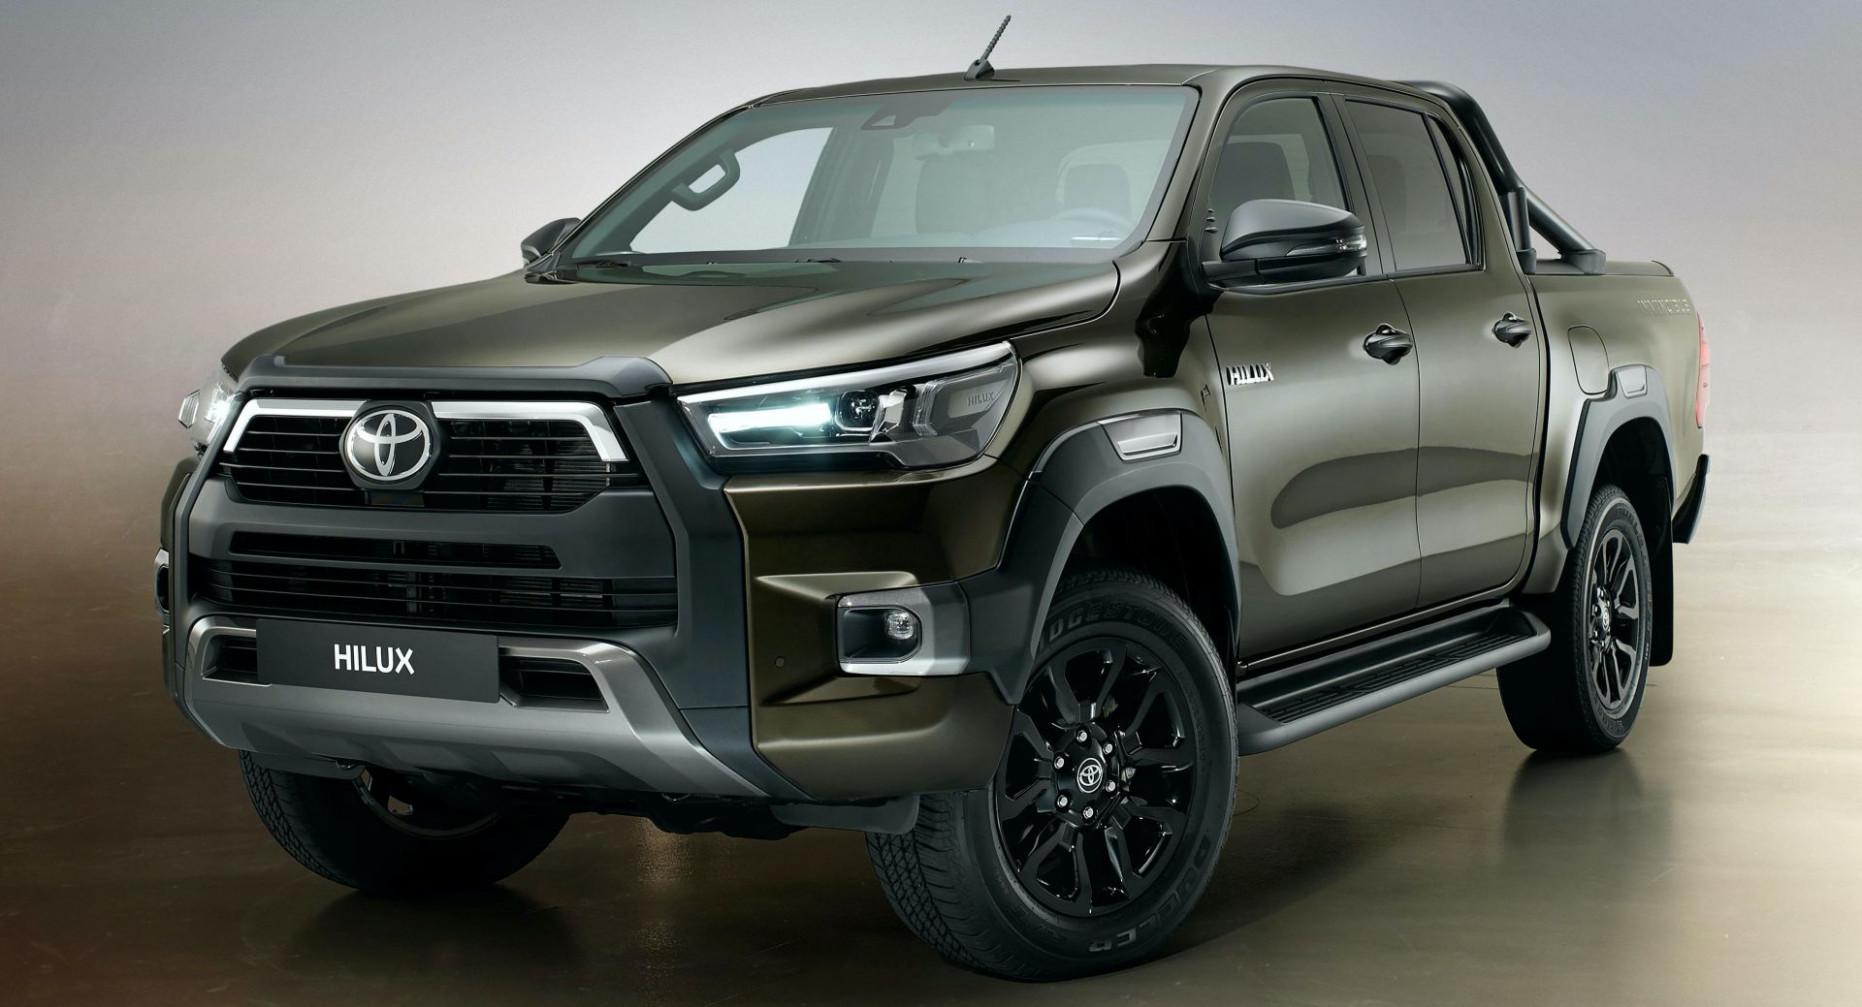 Rumors 2022 Toyota Hilux Spy Shots